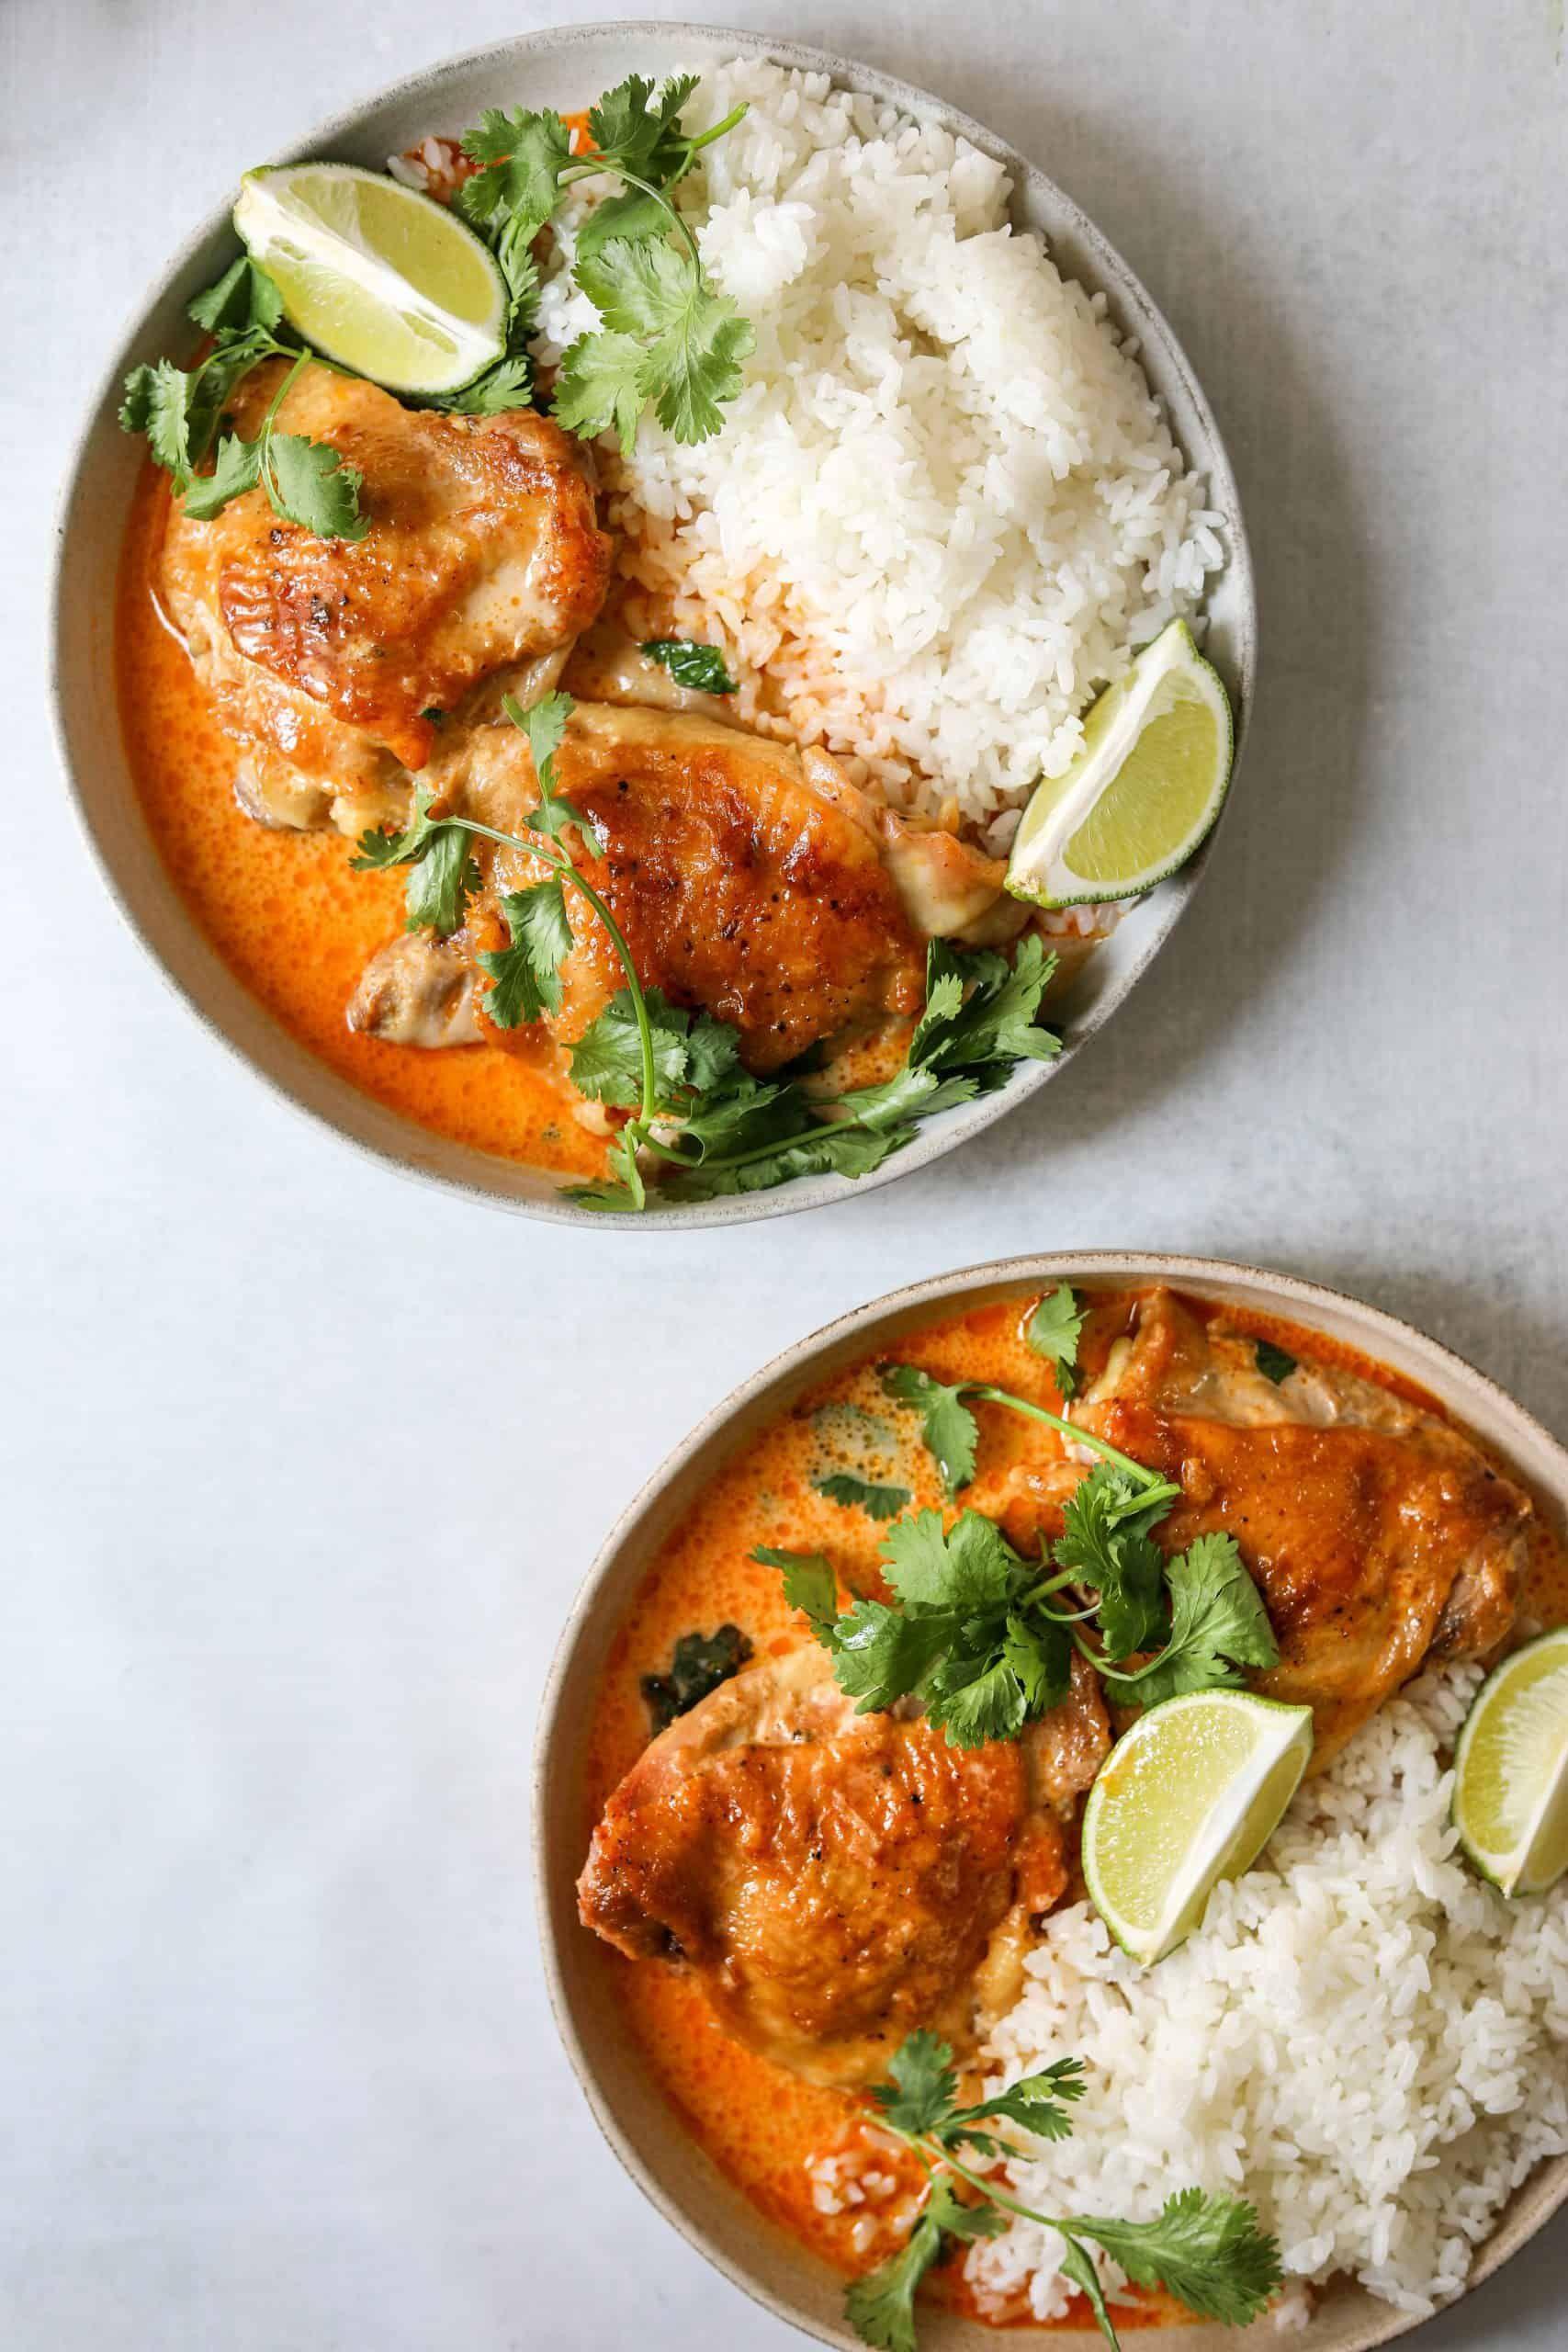 Coconut Milk Braised Chicken With Harissa And Lime Craving California Recipe Braised Chicken Chicken Recipes Coconut Milk Recipes